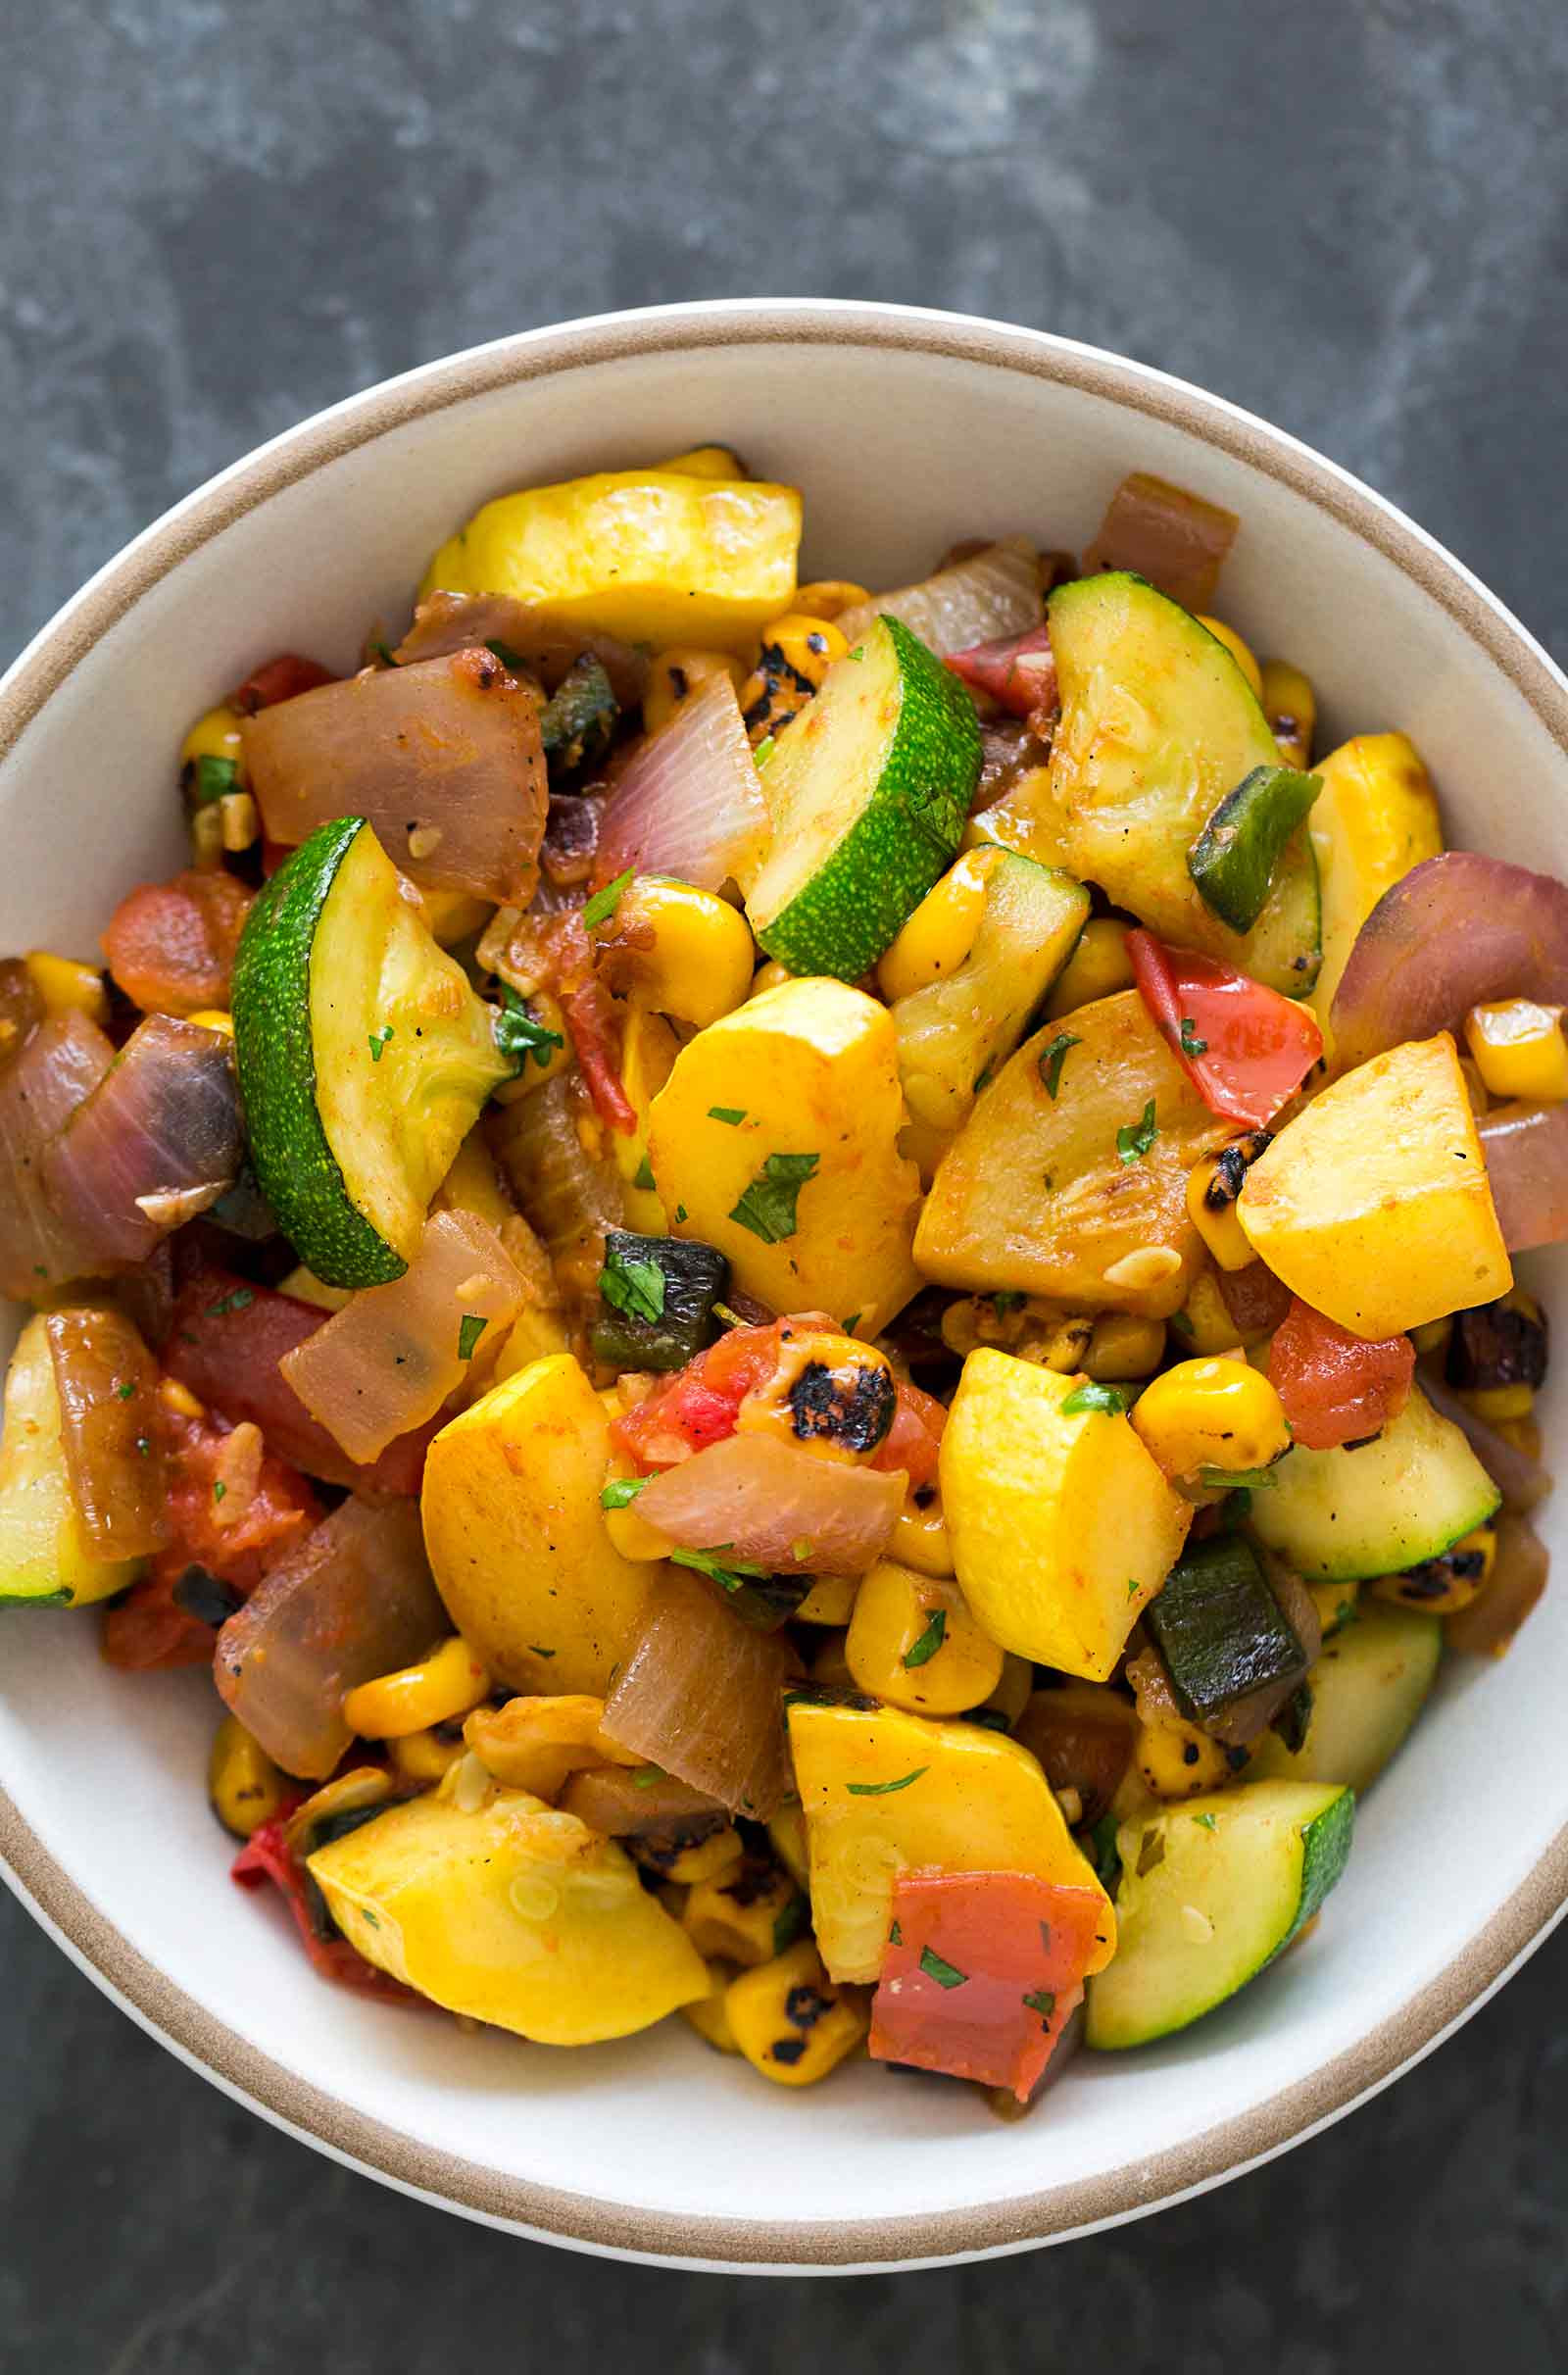 Vegetarian Summer Recipes  Summer Squash Green Chile Stir Fry Recipe